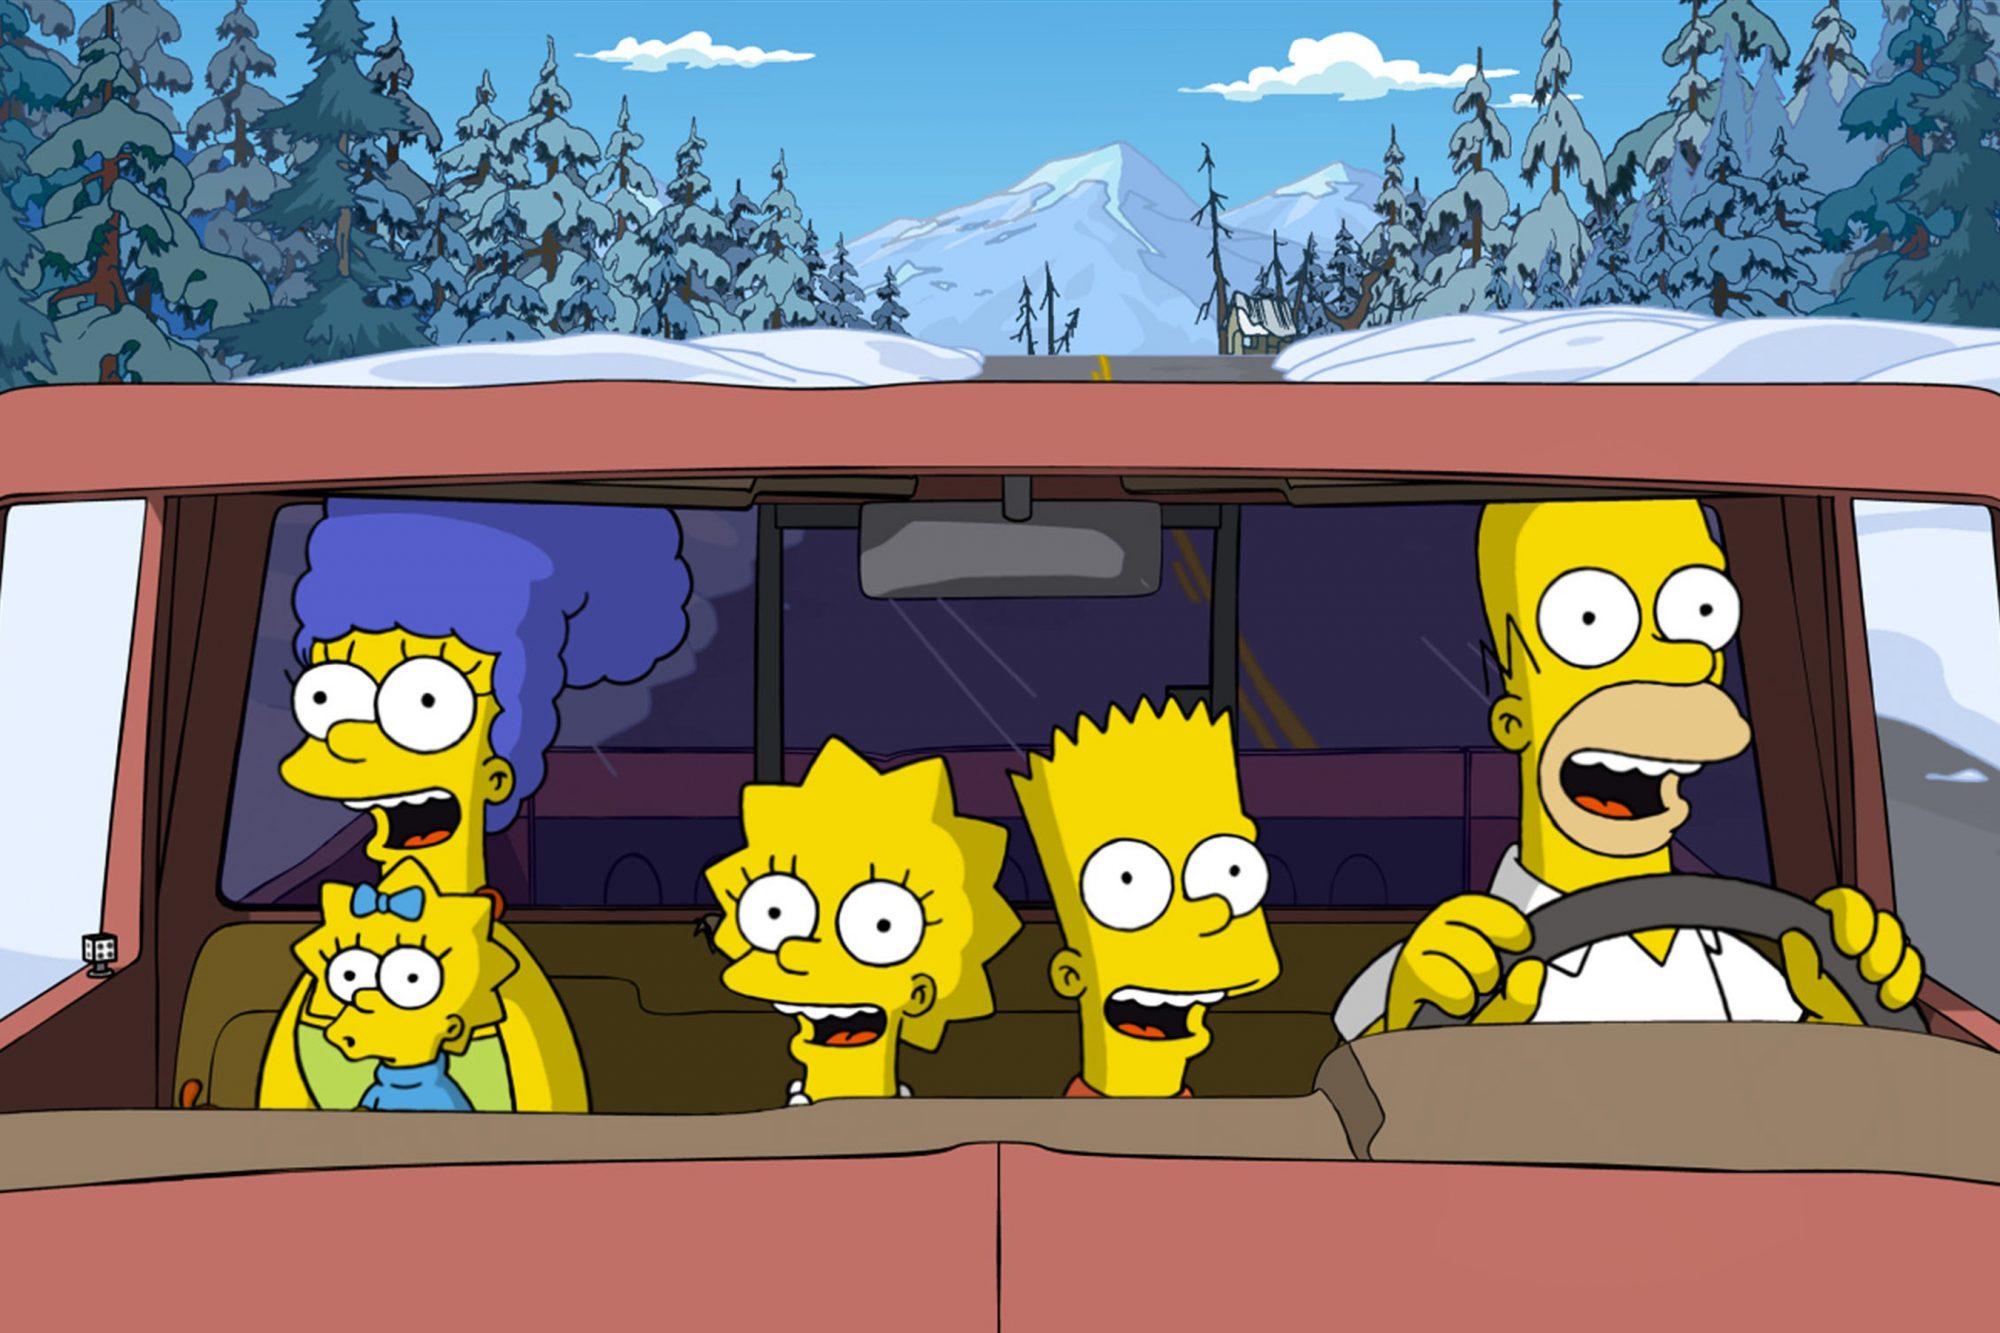 THE SIMPSONS MOVIE, Marge Simpson (back left, voice: Julie Kavner), Maggie Simpson (front left), Lis